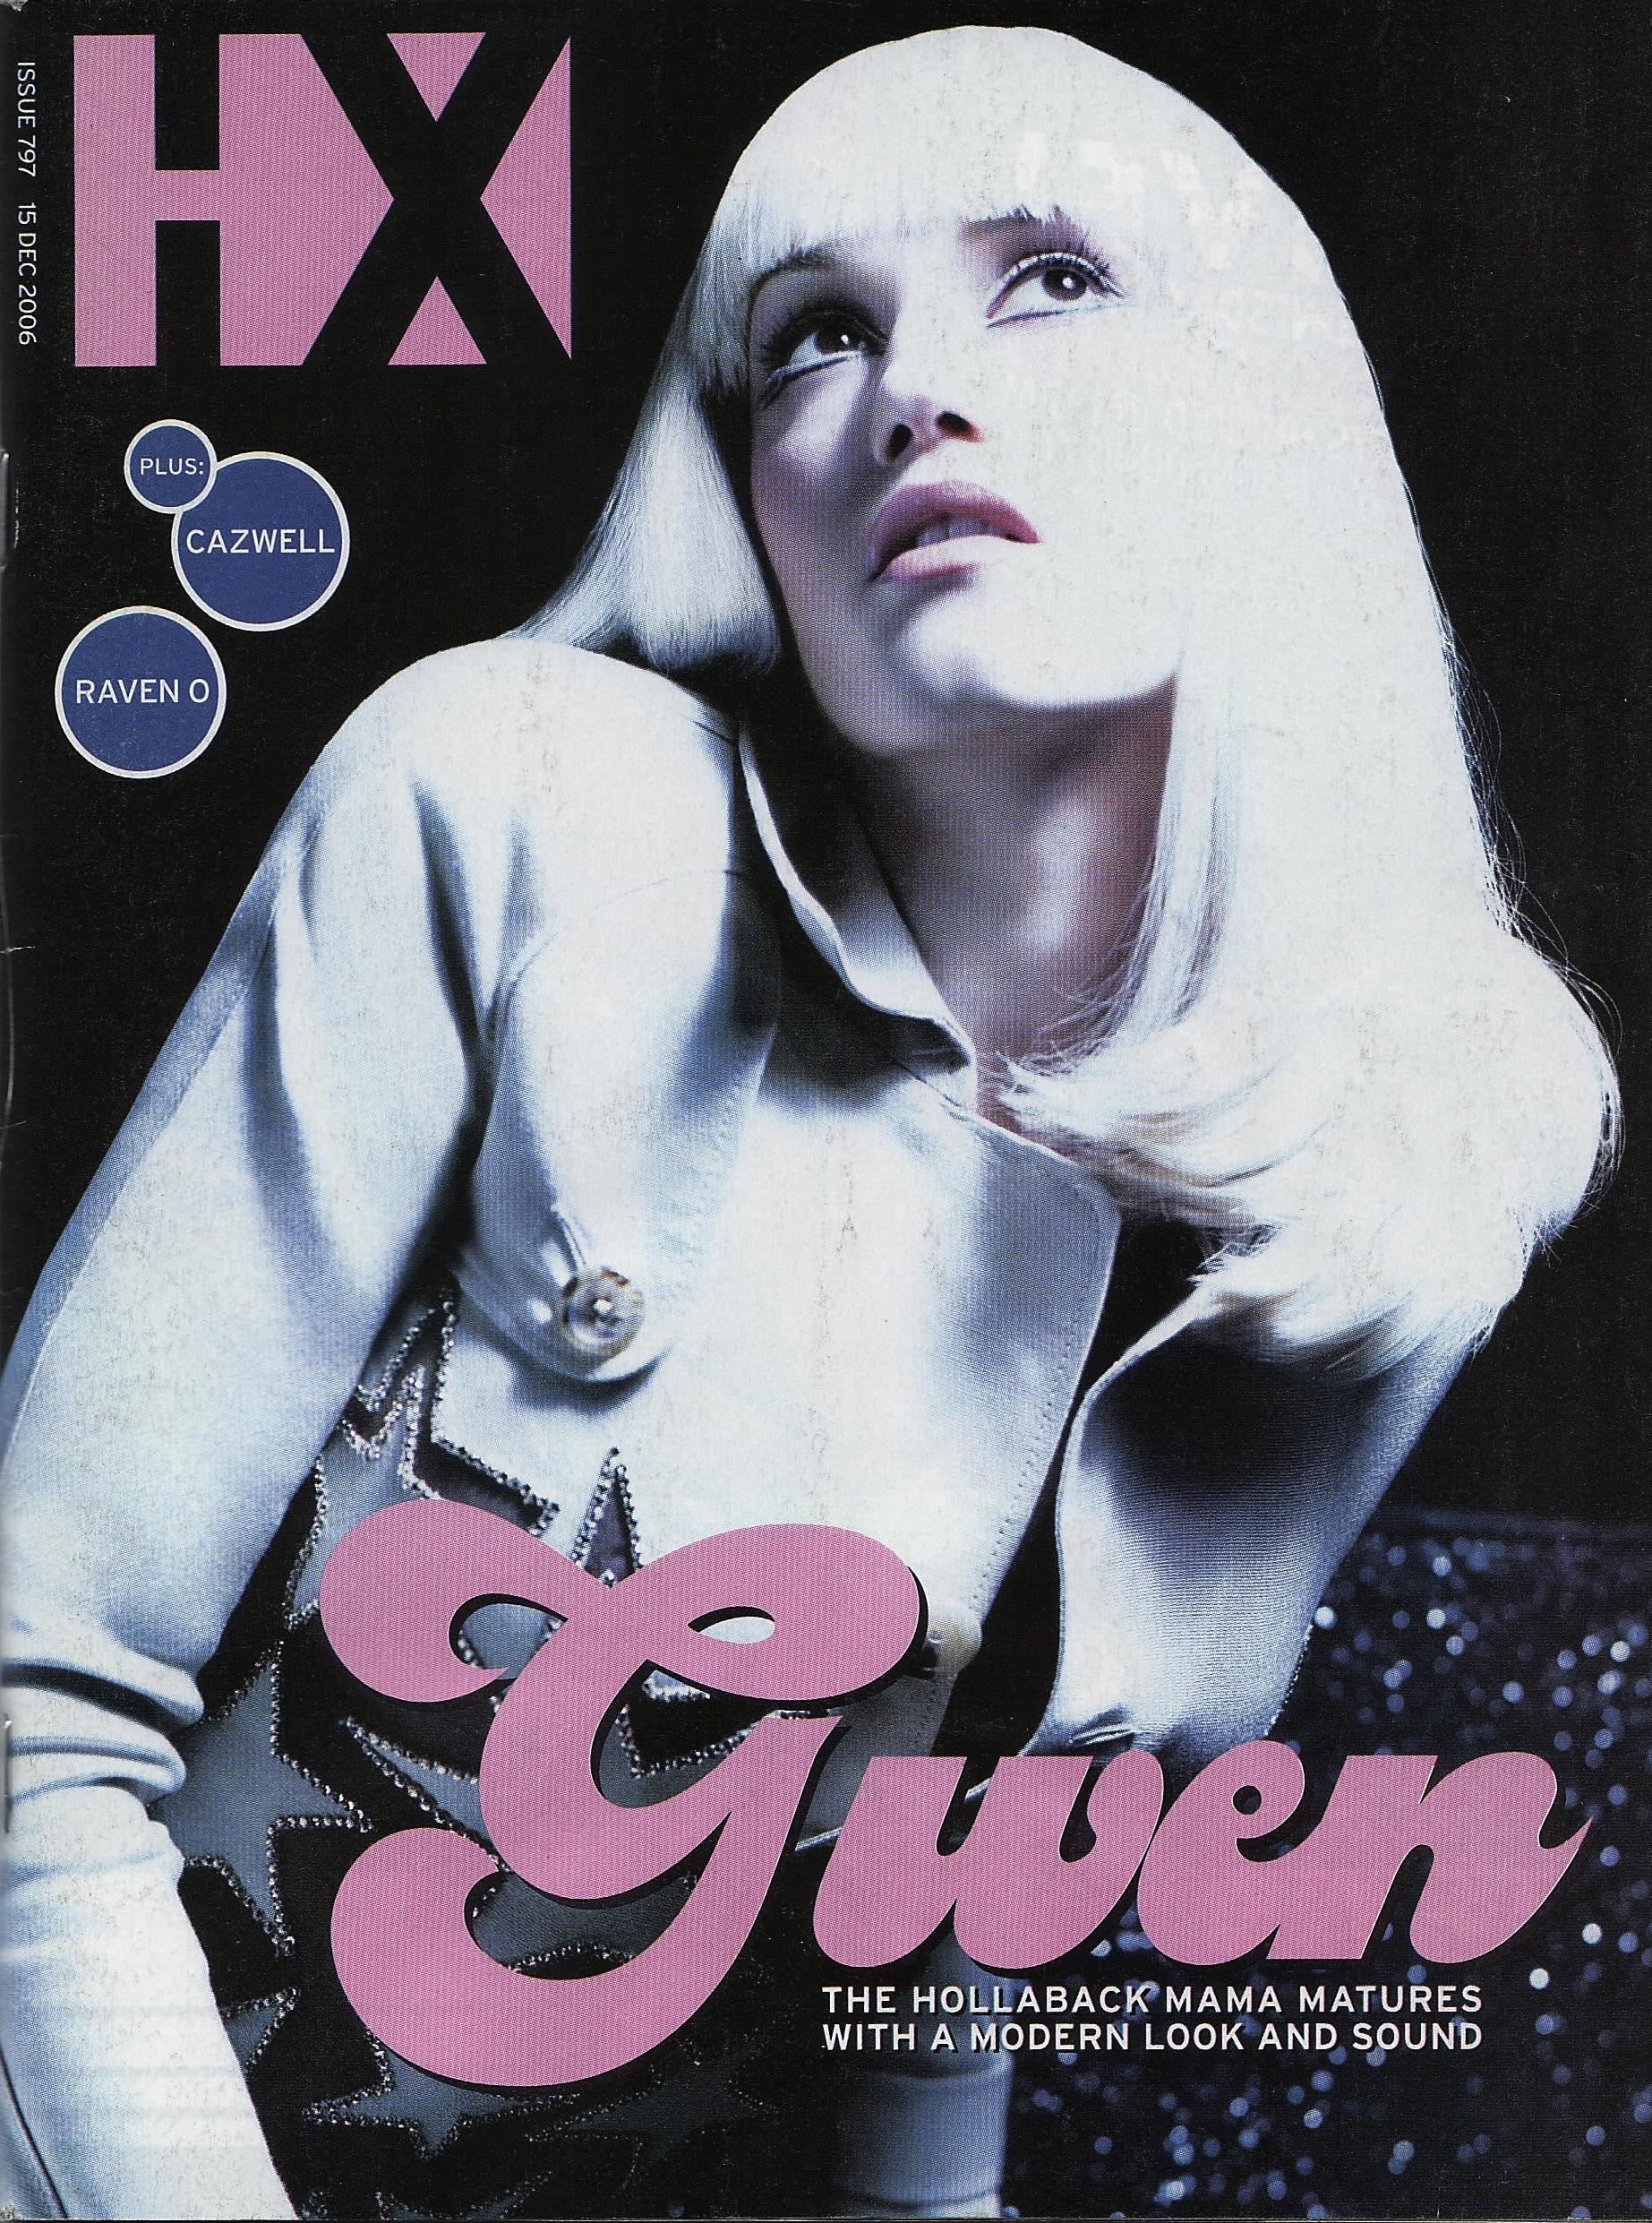 GwenHXcover.JPG